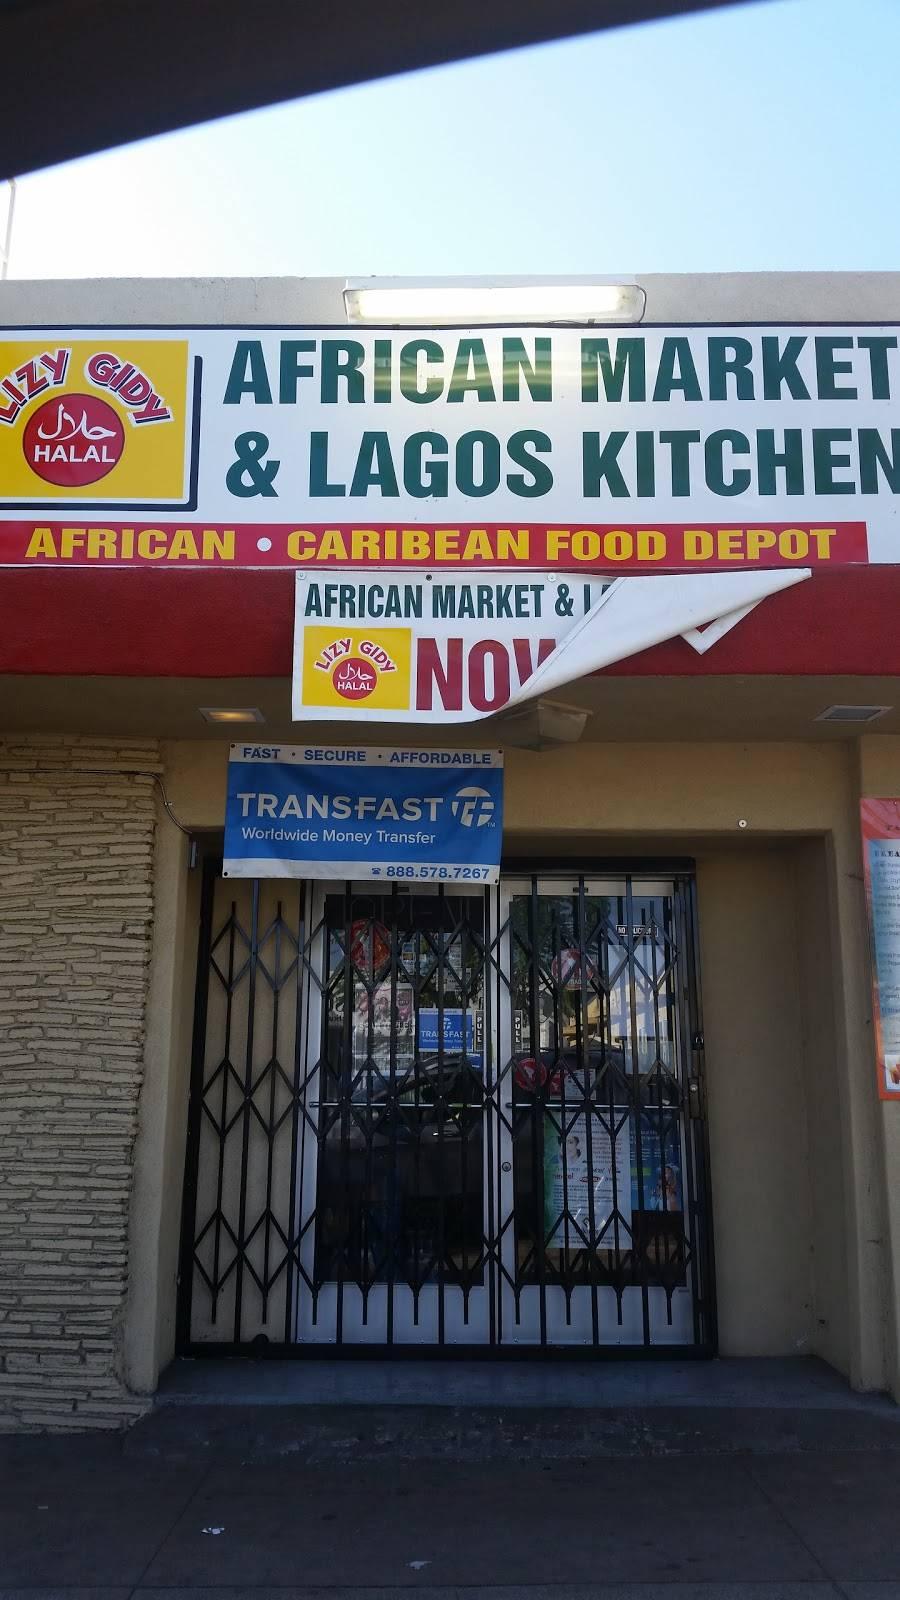 Lizy Gidy African Market | restaurant | 3727 University Ave, San Diego, CA 92105, USA | 6192556926 OR +1 619-255-6926